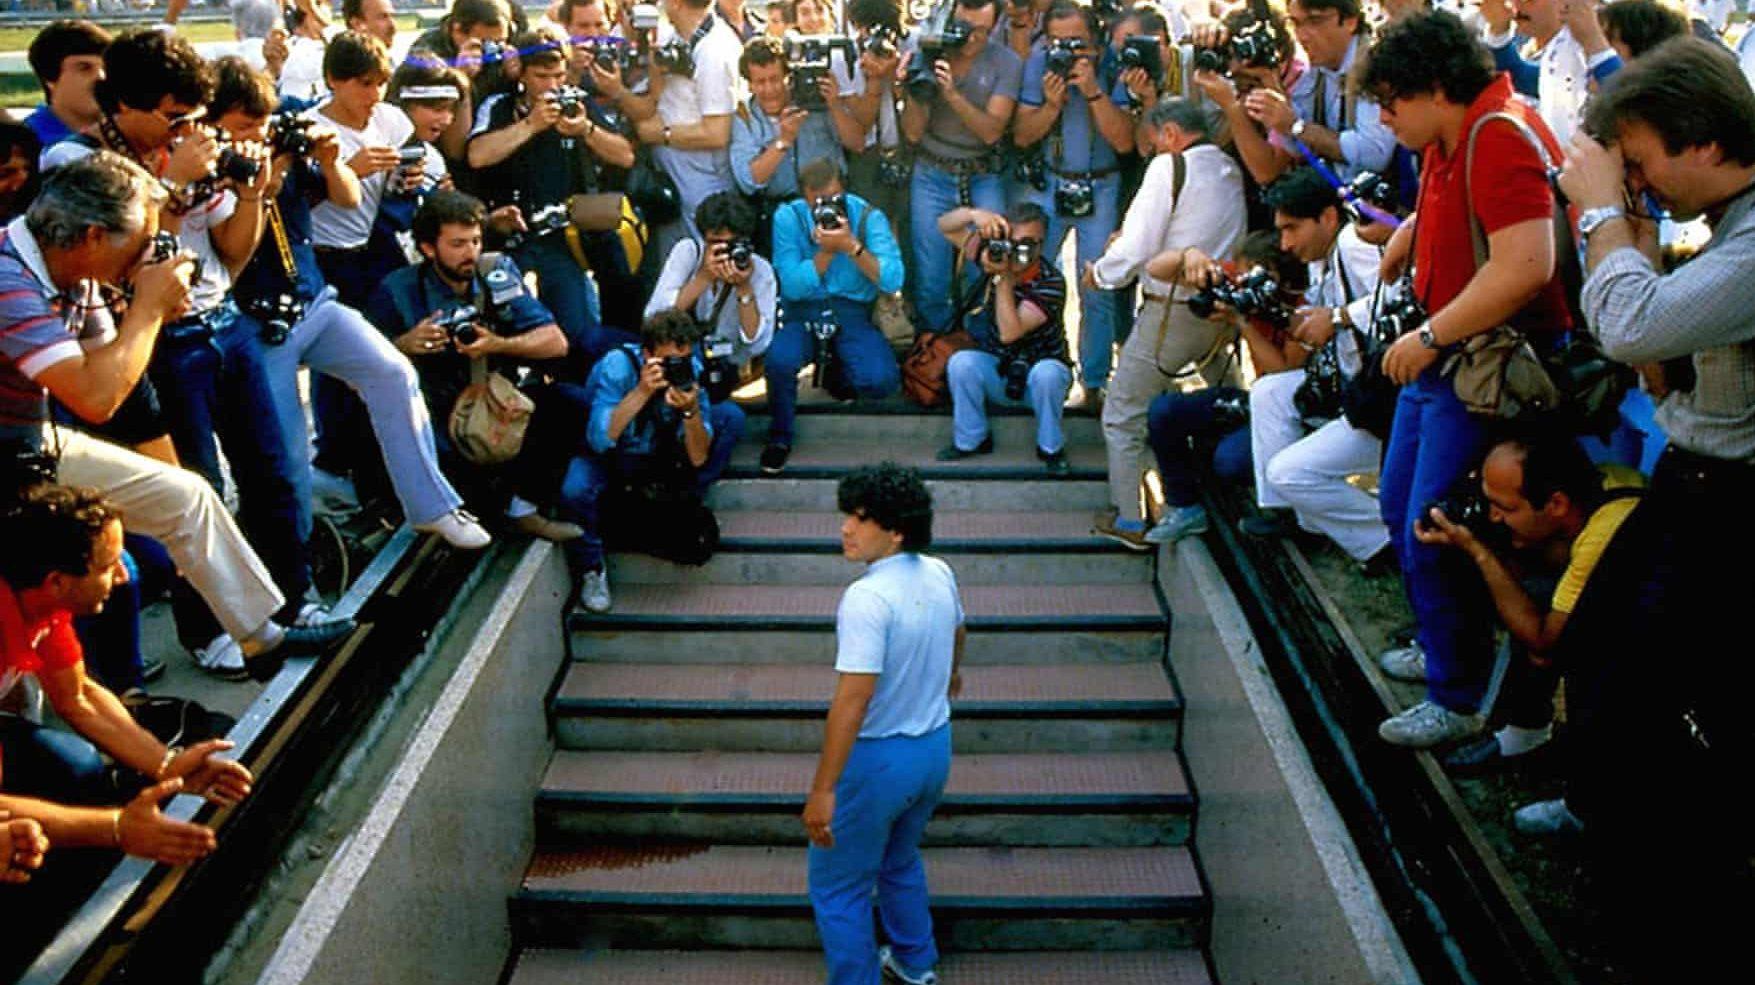 Diego Armando Maradona enters the San Paolo Stadium for the first time